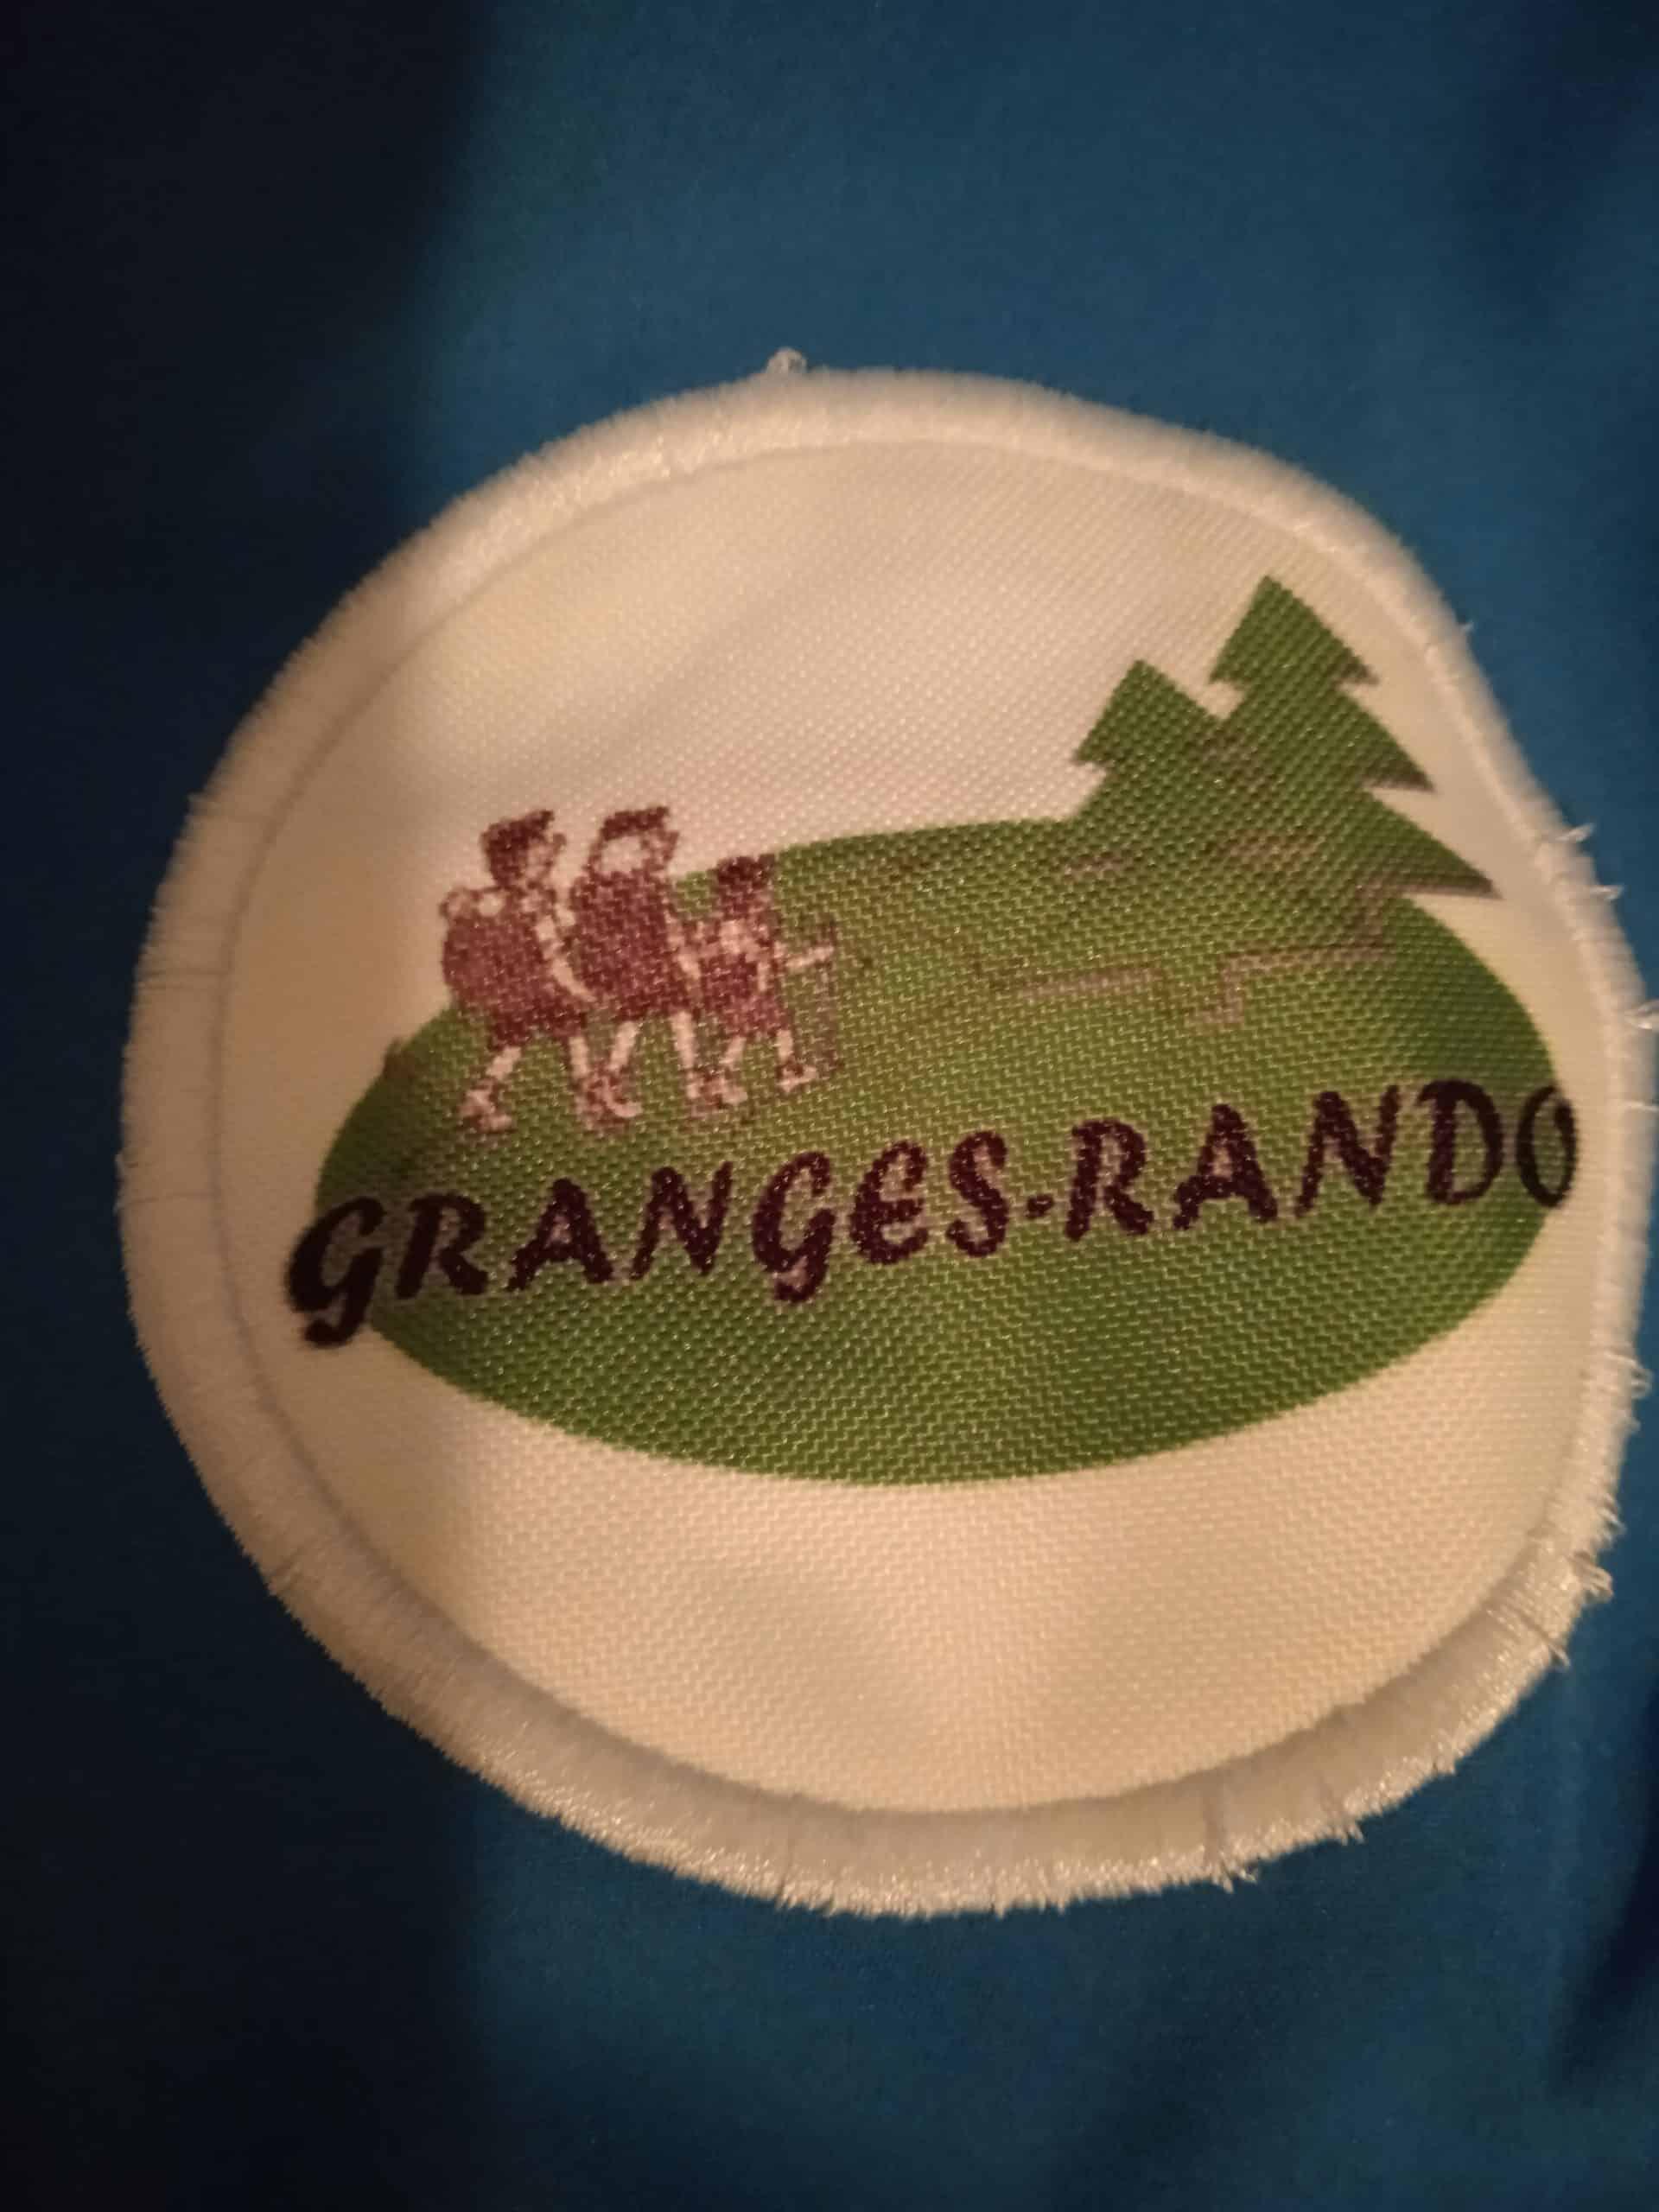 GRANGES RANDO Granges-Aumontzey